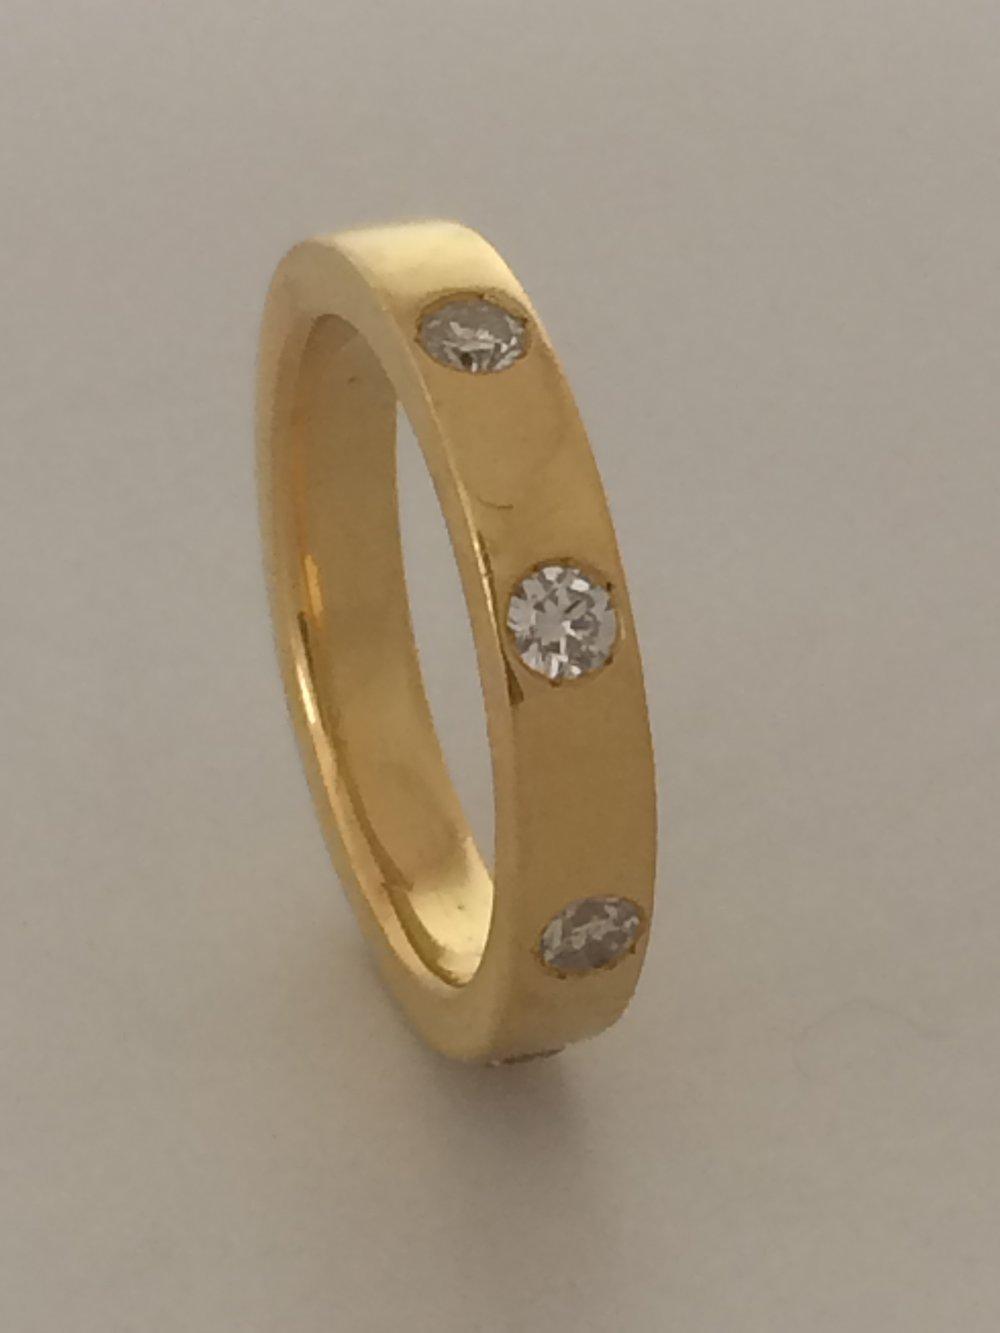 Student's work. 22 karat solid gold band with eight flush set diamonds.